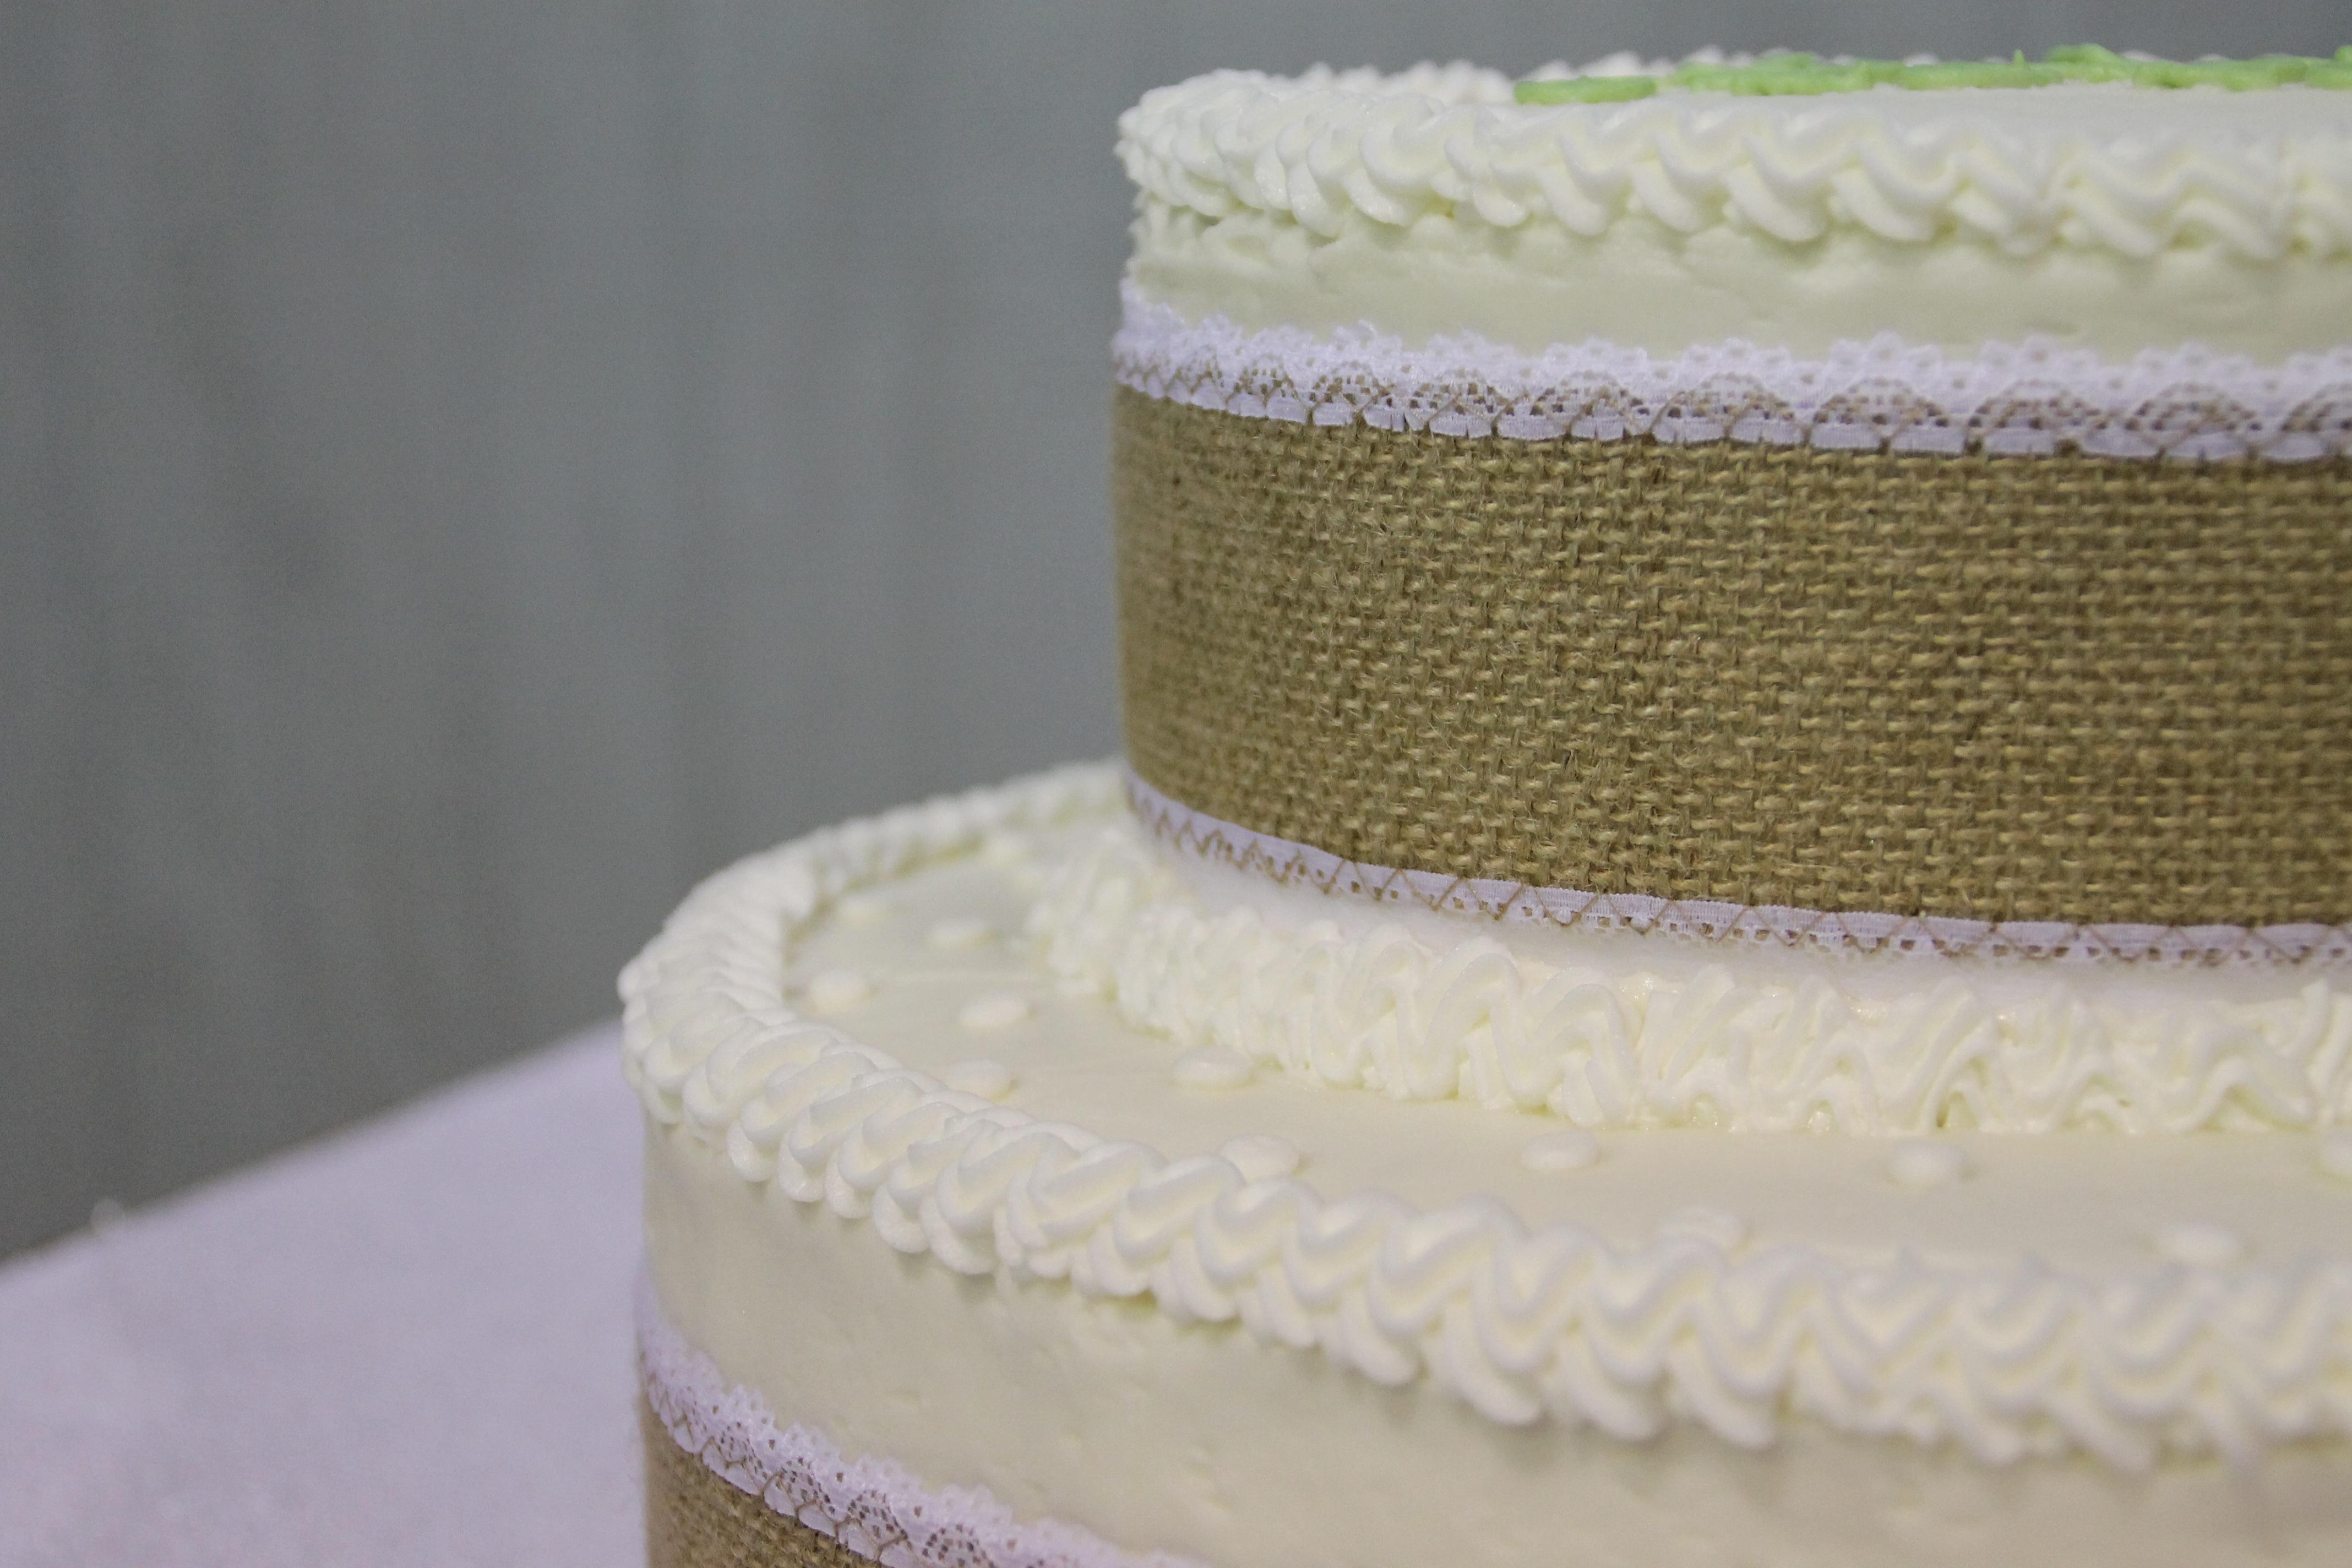 fotos gratis blanco dulce celebracion amor decoracin comida postre boda comer matrimonio delicioso pasteles celebrar horneado arpillera